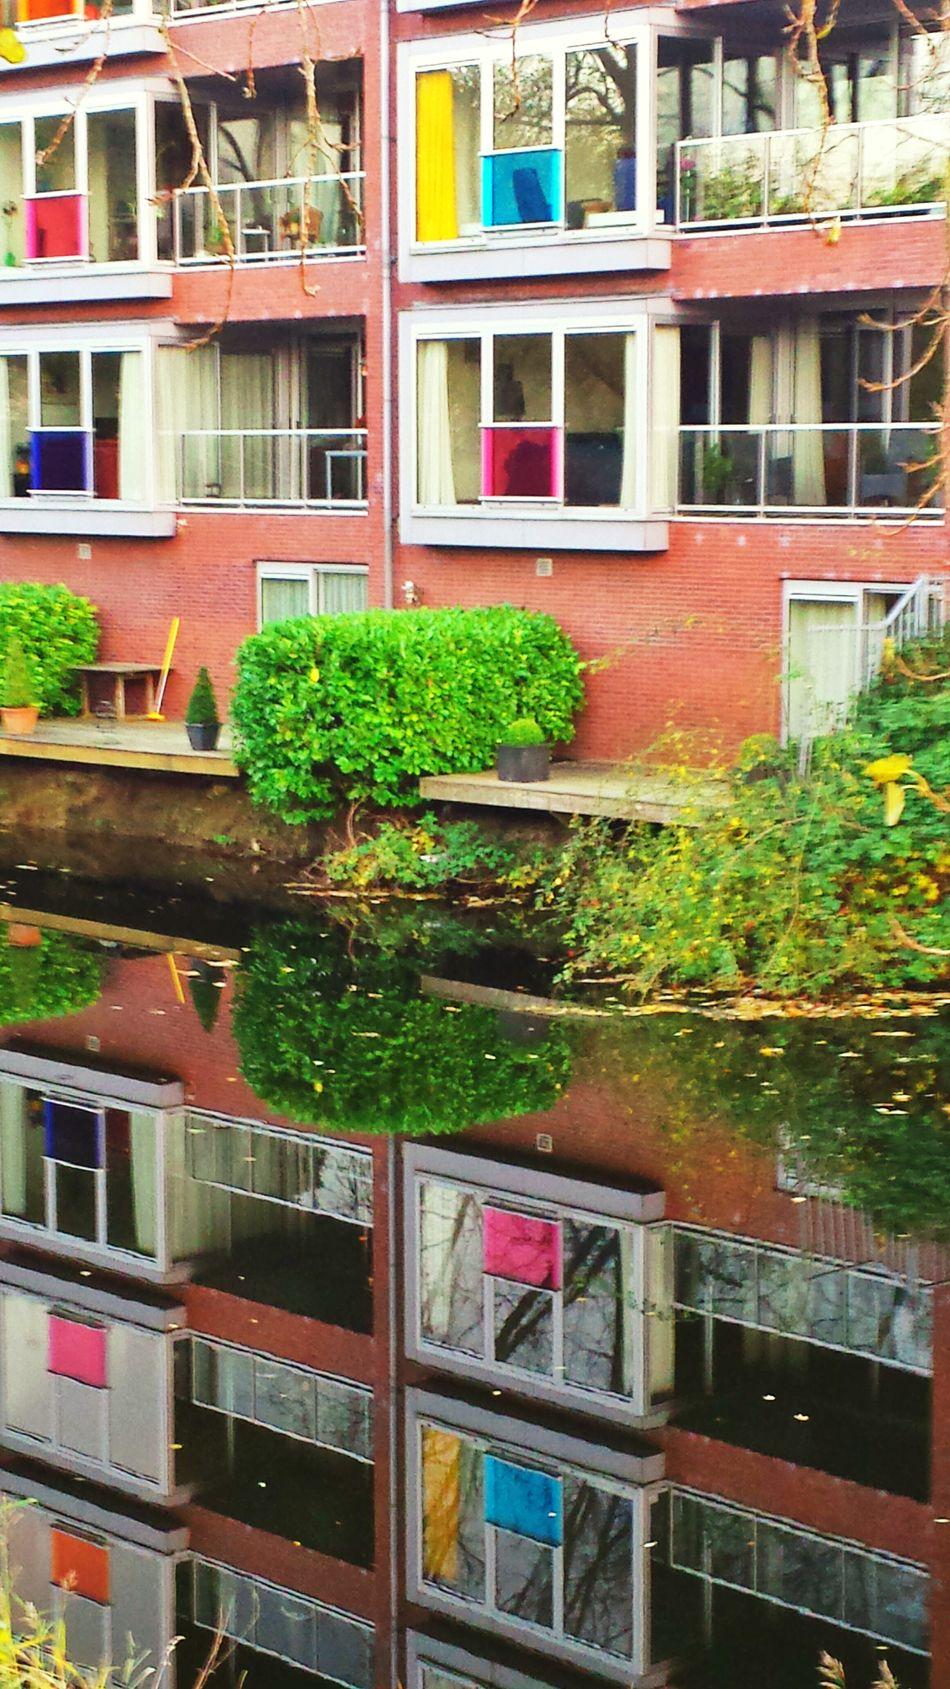 Global EyeEm Adventure - Groningen Eyeemgroupnederland Photography Buildings